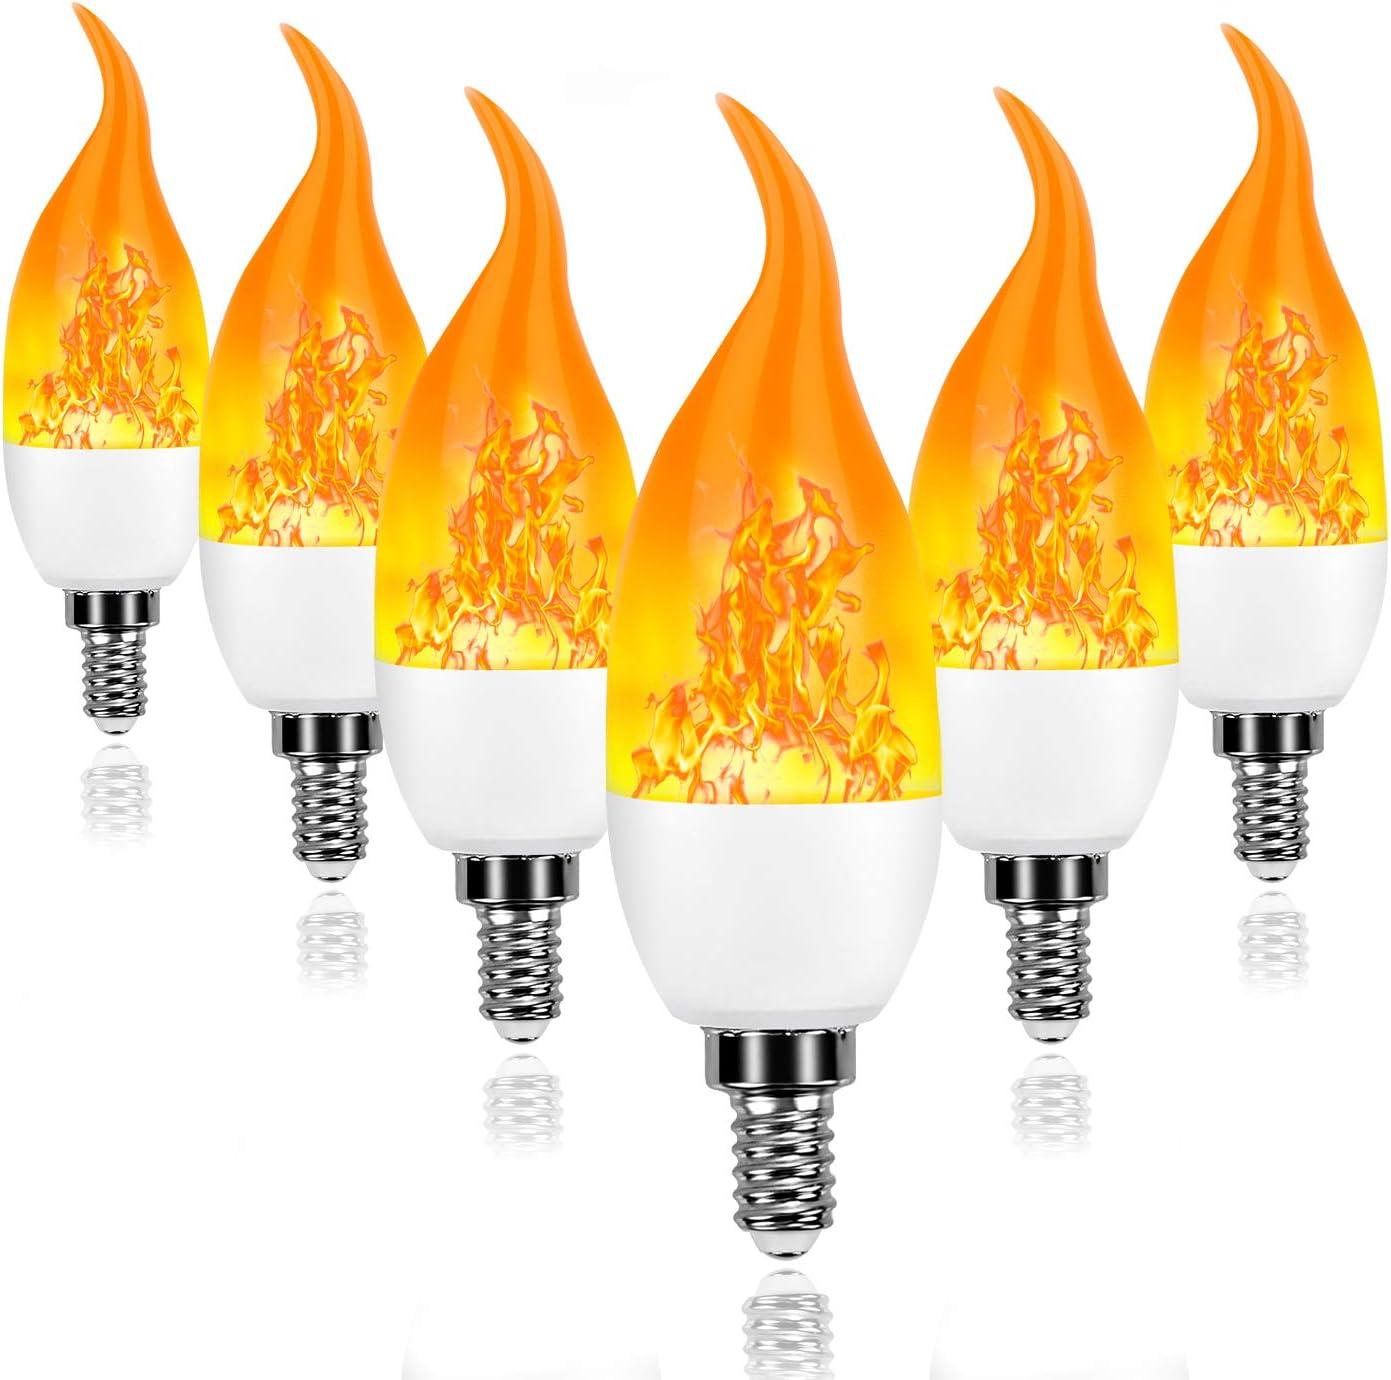 LED Flickering Flame Bulb 4 Lighting Modes Creative Decorative Light Bulbs for Halloween Christmas Home Hotel Bar Party,2 Pack YANGMAN-L B22 Base Blue Flame Light Bulb